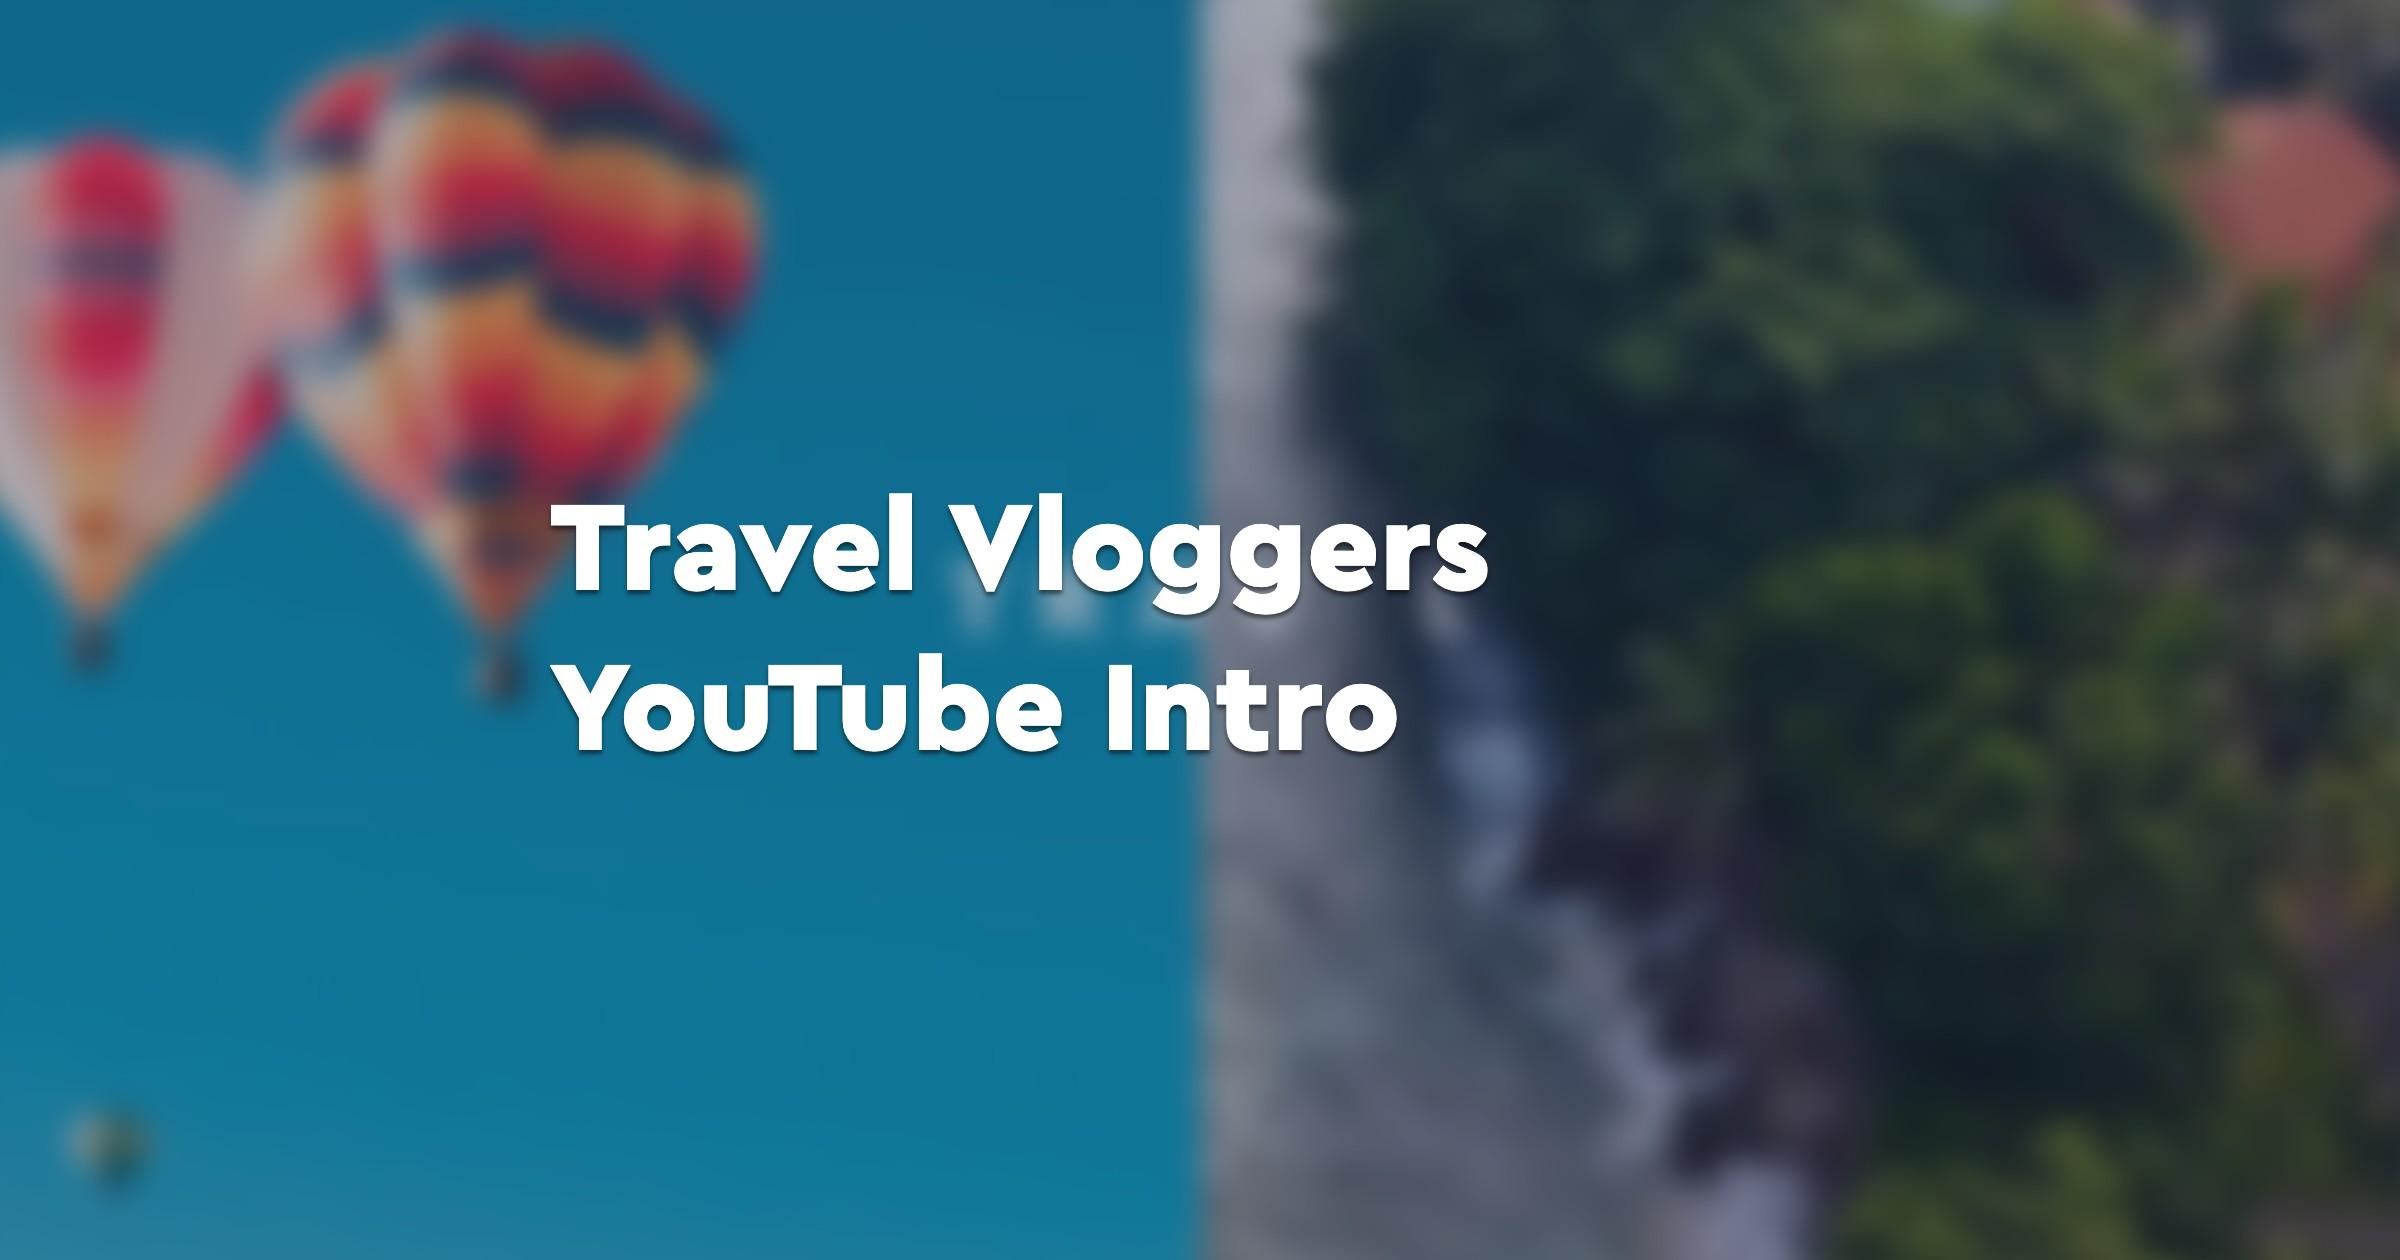 Travel Vloggers YouTube Intro